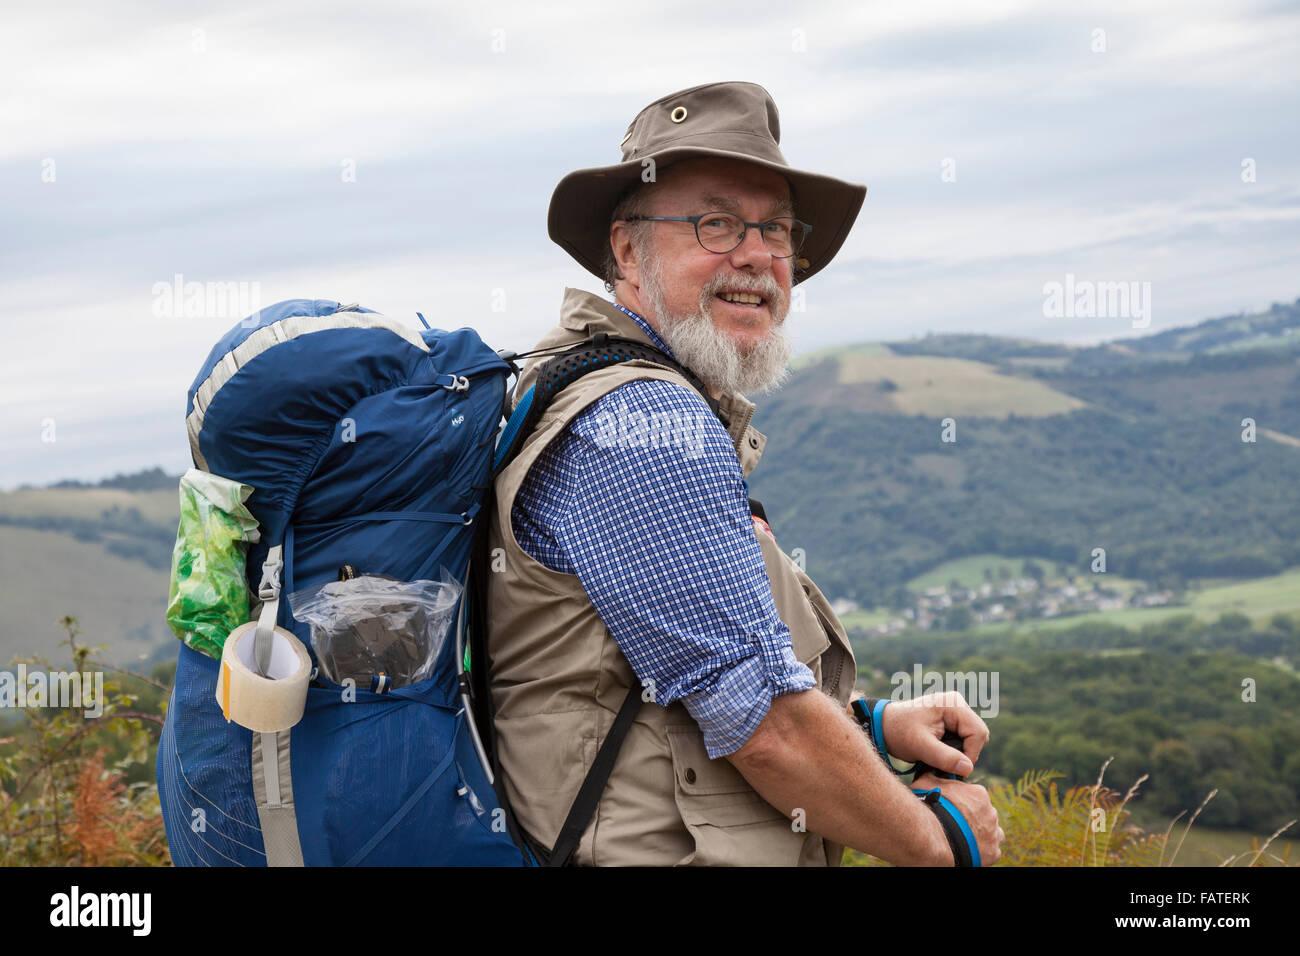 Pilgrim from Sweden near the village of Ordiarp on the Voie du Piémont route of the Camino de Santiago. Stock Photo